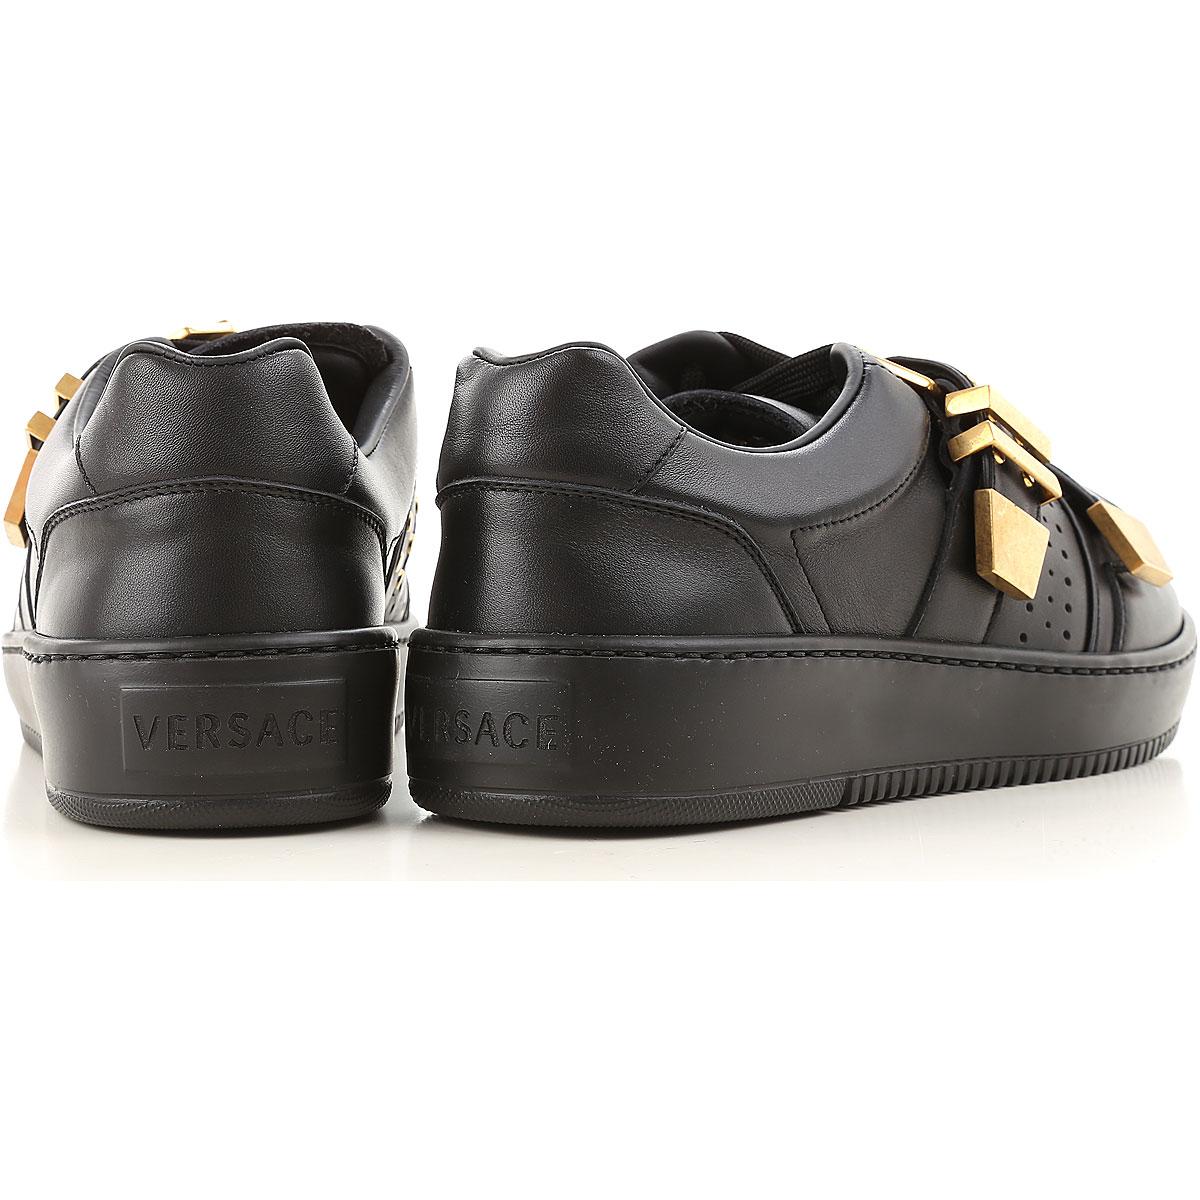 Scarpe Uomo Sneakers Versace Offerte Limitate